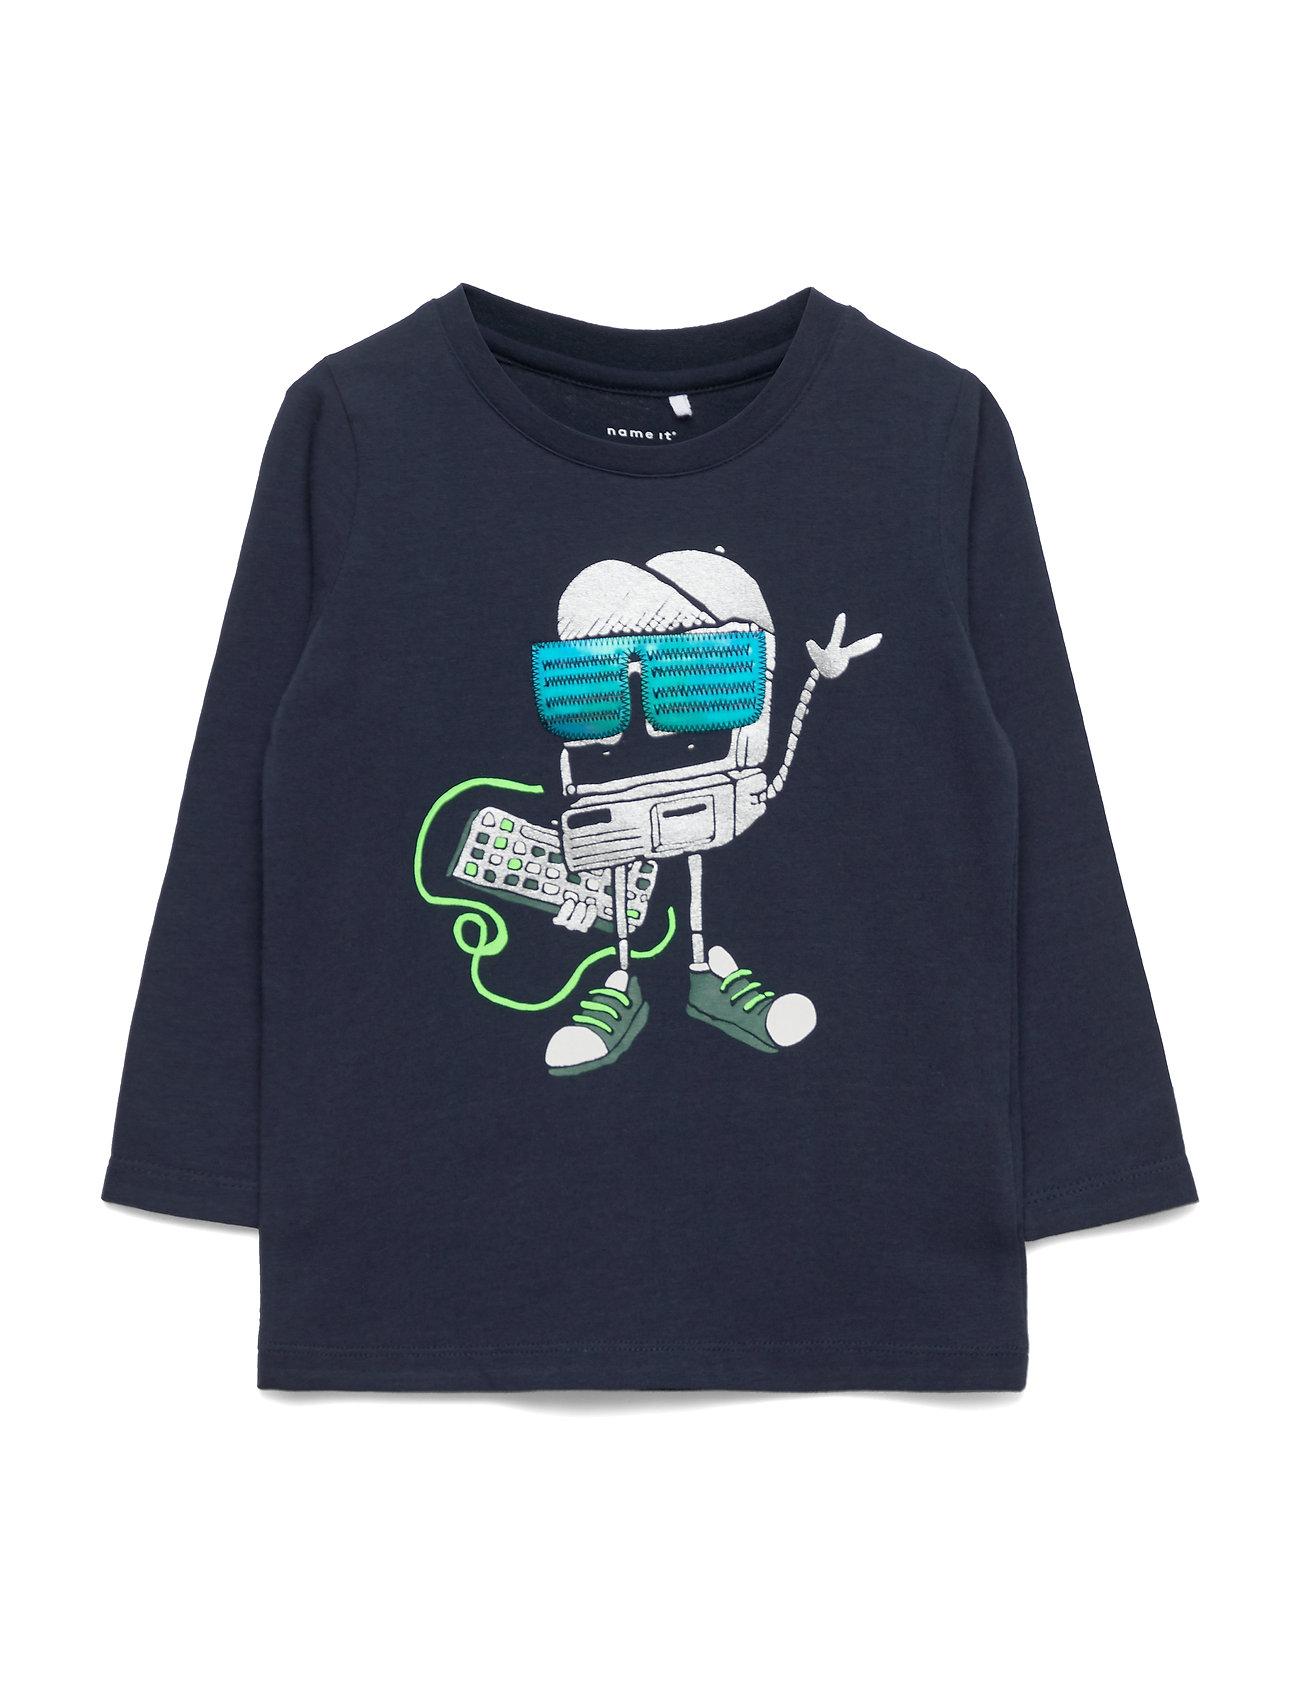 Image of Nmmbobotti Ls Top Box Langærmet T-shirt Blå Name It (3350046135)